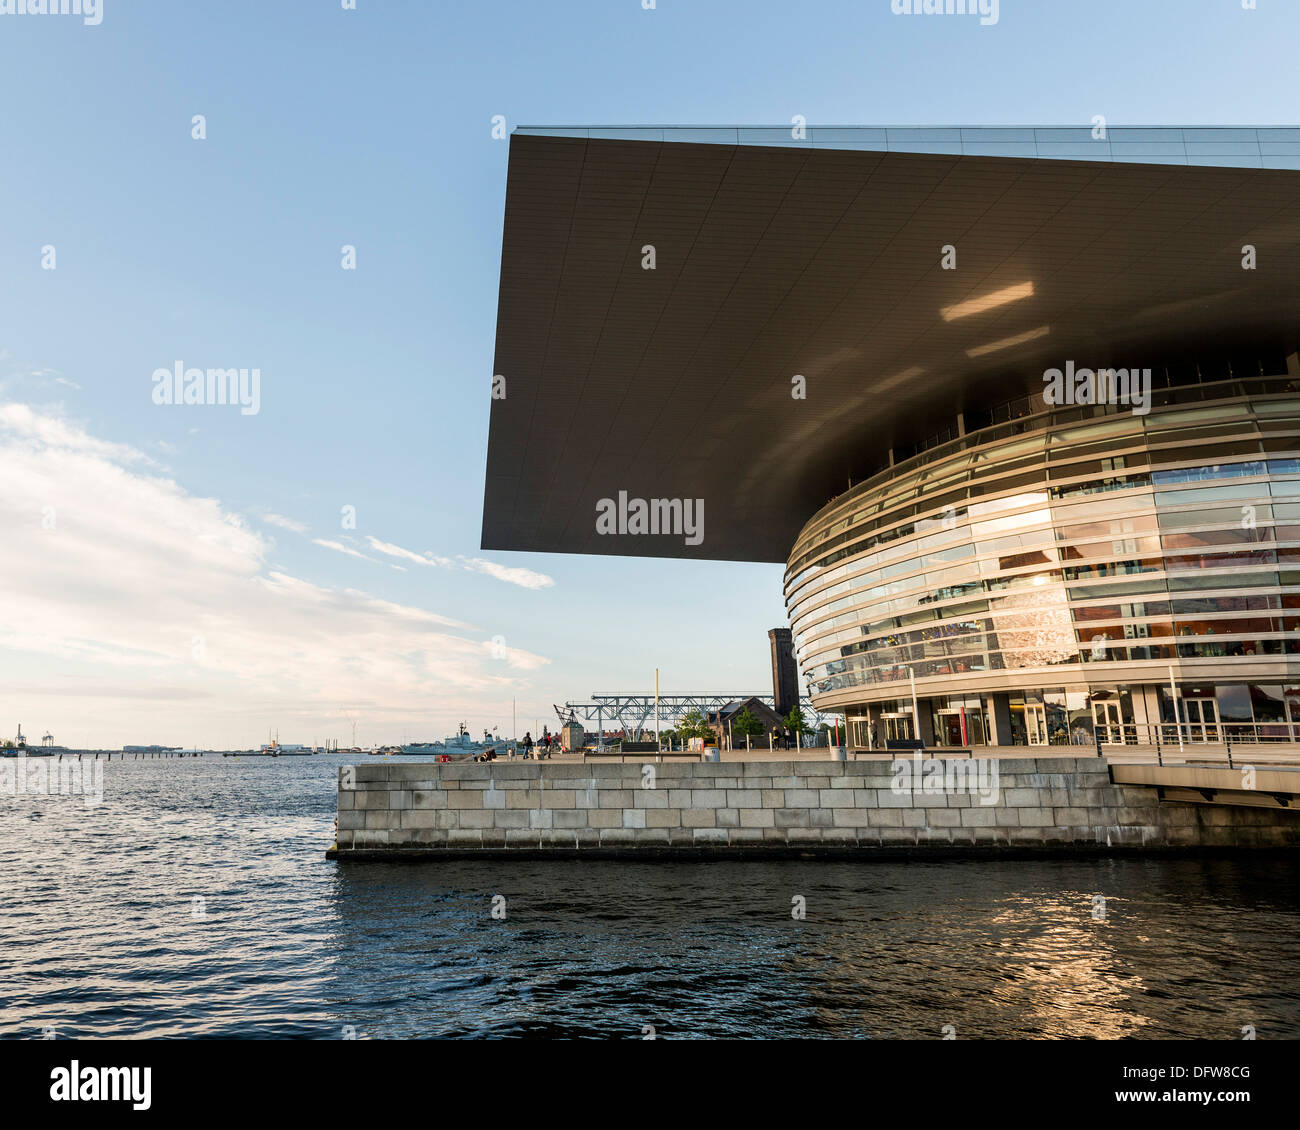 Copenhagen Opera House (Operaen), Copenhagen, Denmark. Architect: Henning Larsen, 2004. Front side view with water. Stock Photo